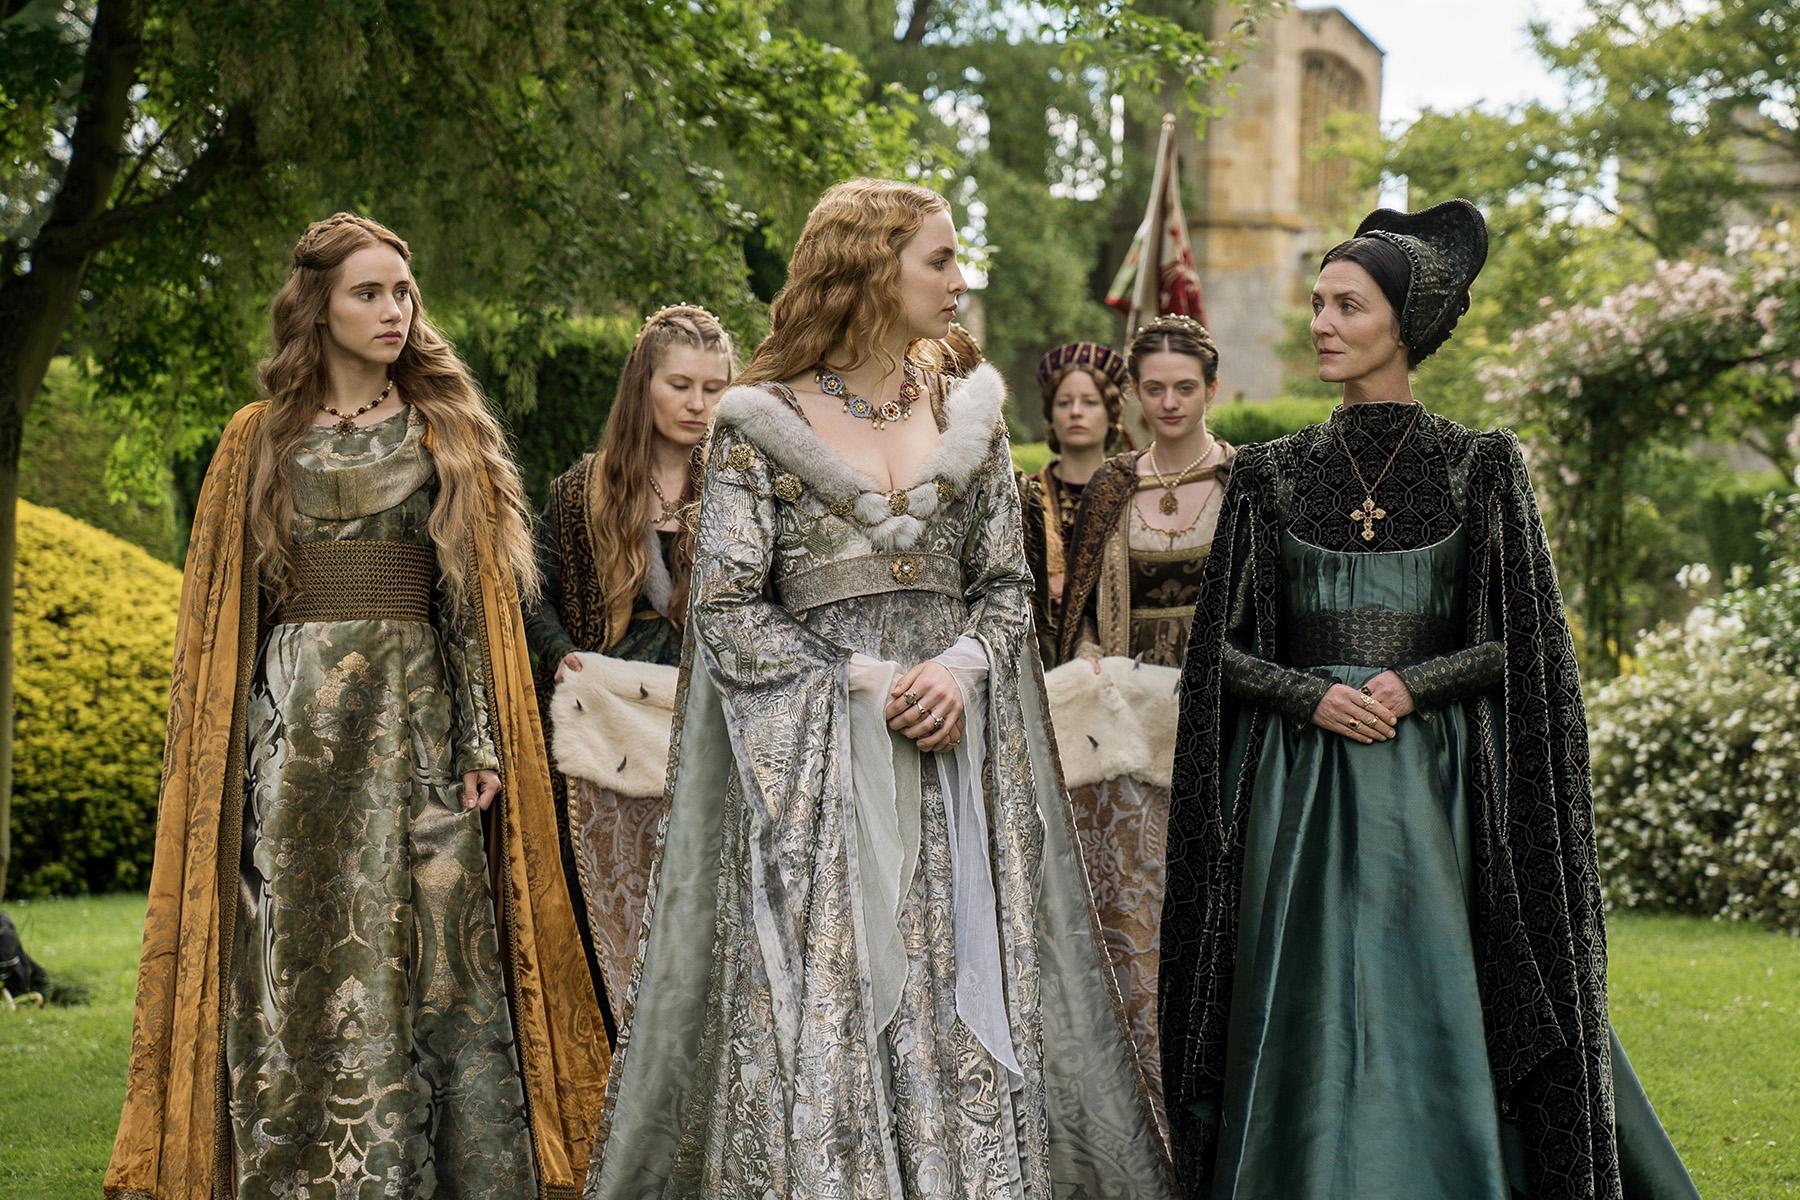 SukiWaterhouse(CecilyOfYork)JodieComer(ElizabethOfYork)MichelleFairley(LadyMargaretBeaufort).jpg